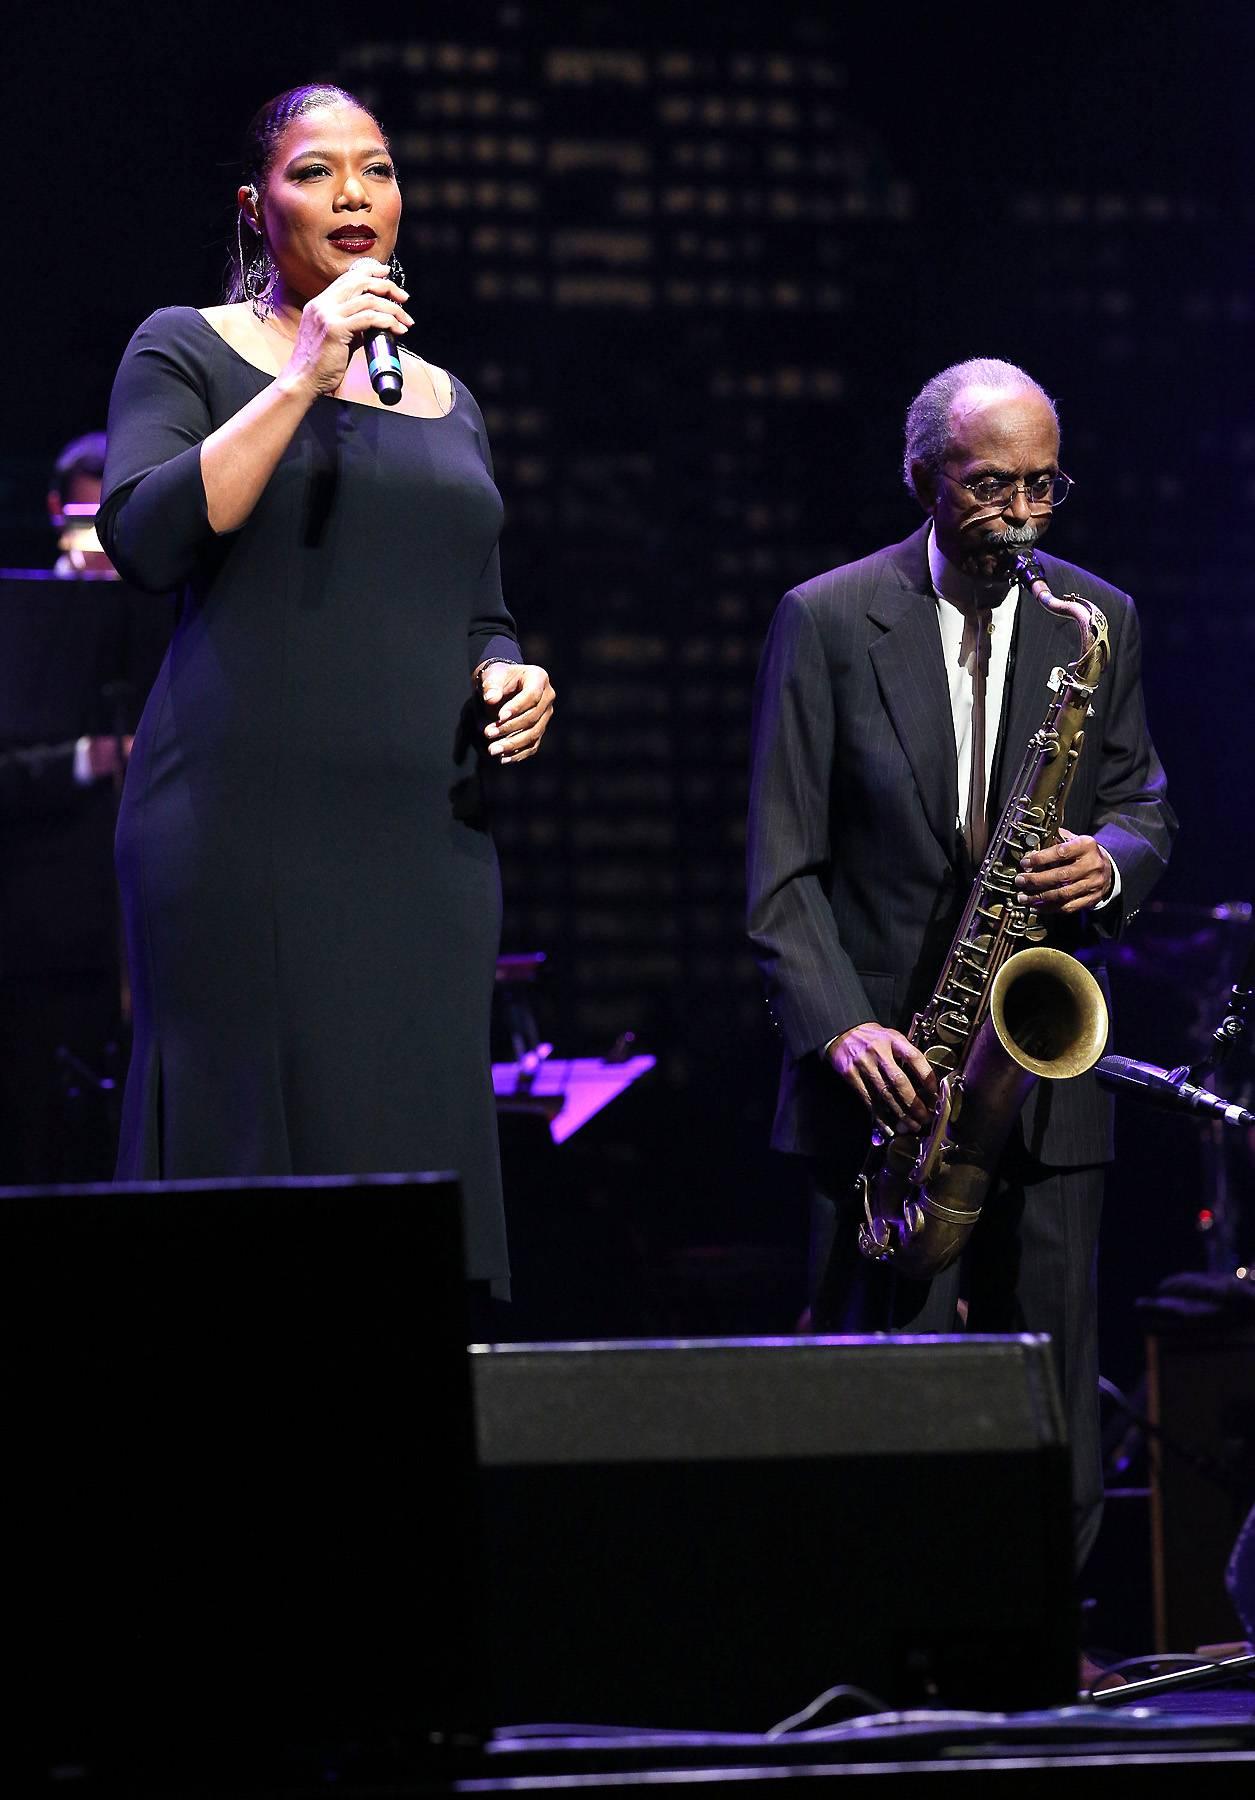 111014-celebs-out-queen-latifah-jazz-performs.jpg